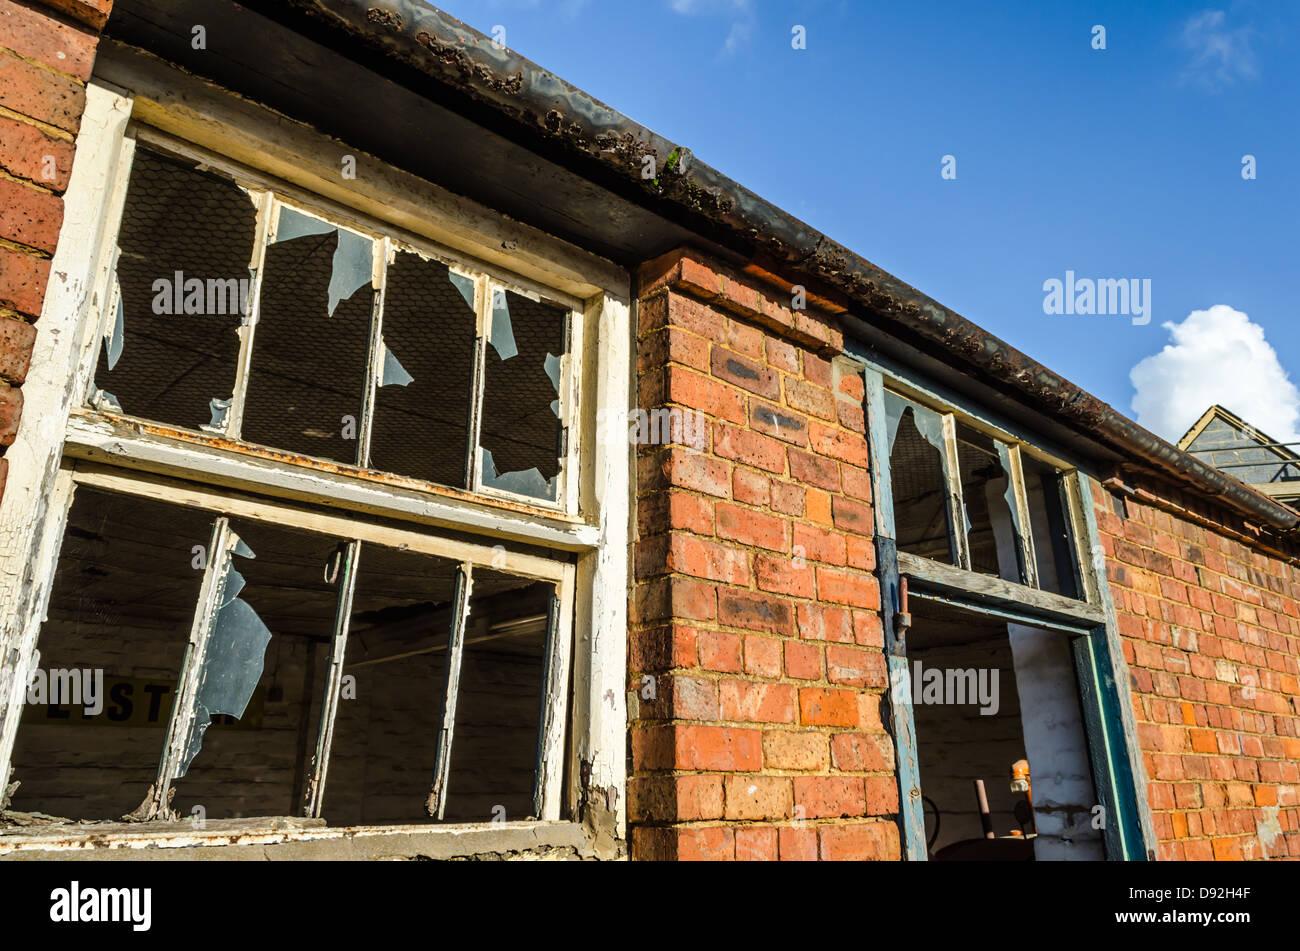 Old brick building in Moreton. Moreton-in-Marsh, Gloucestershire, England. - Stock Image